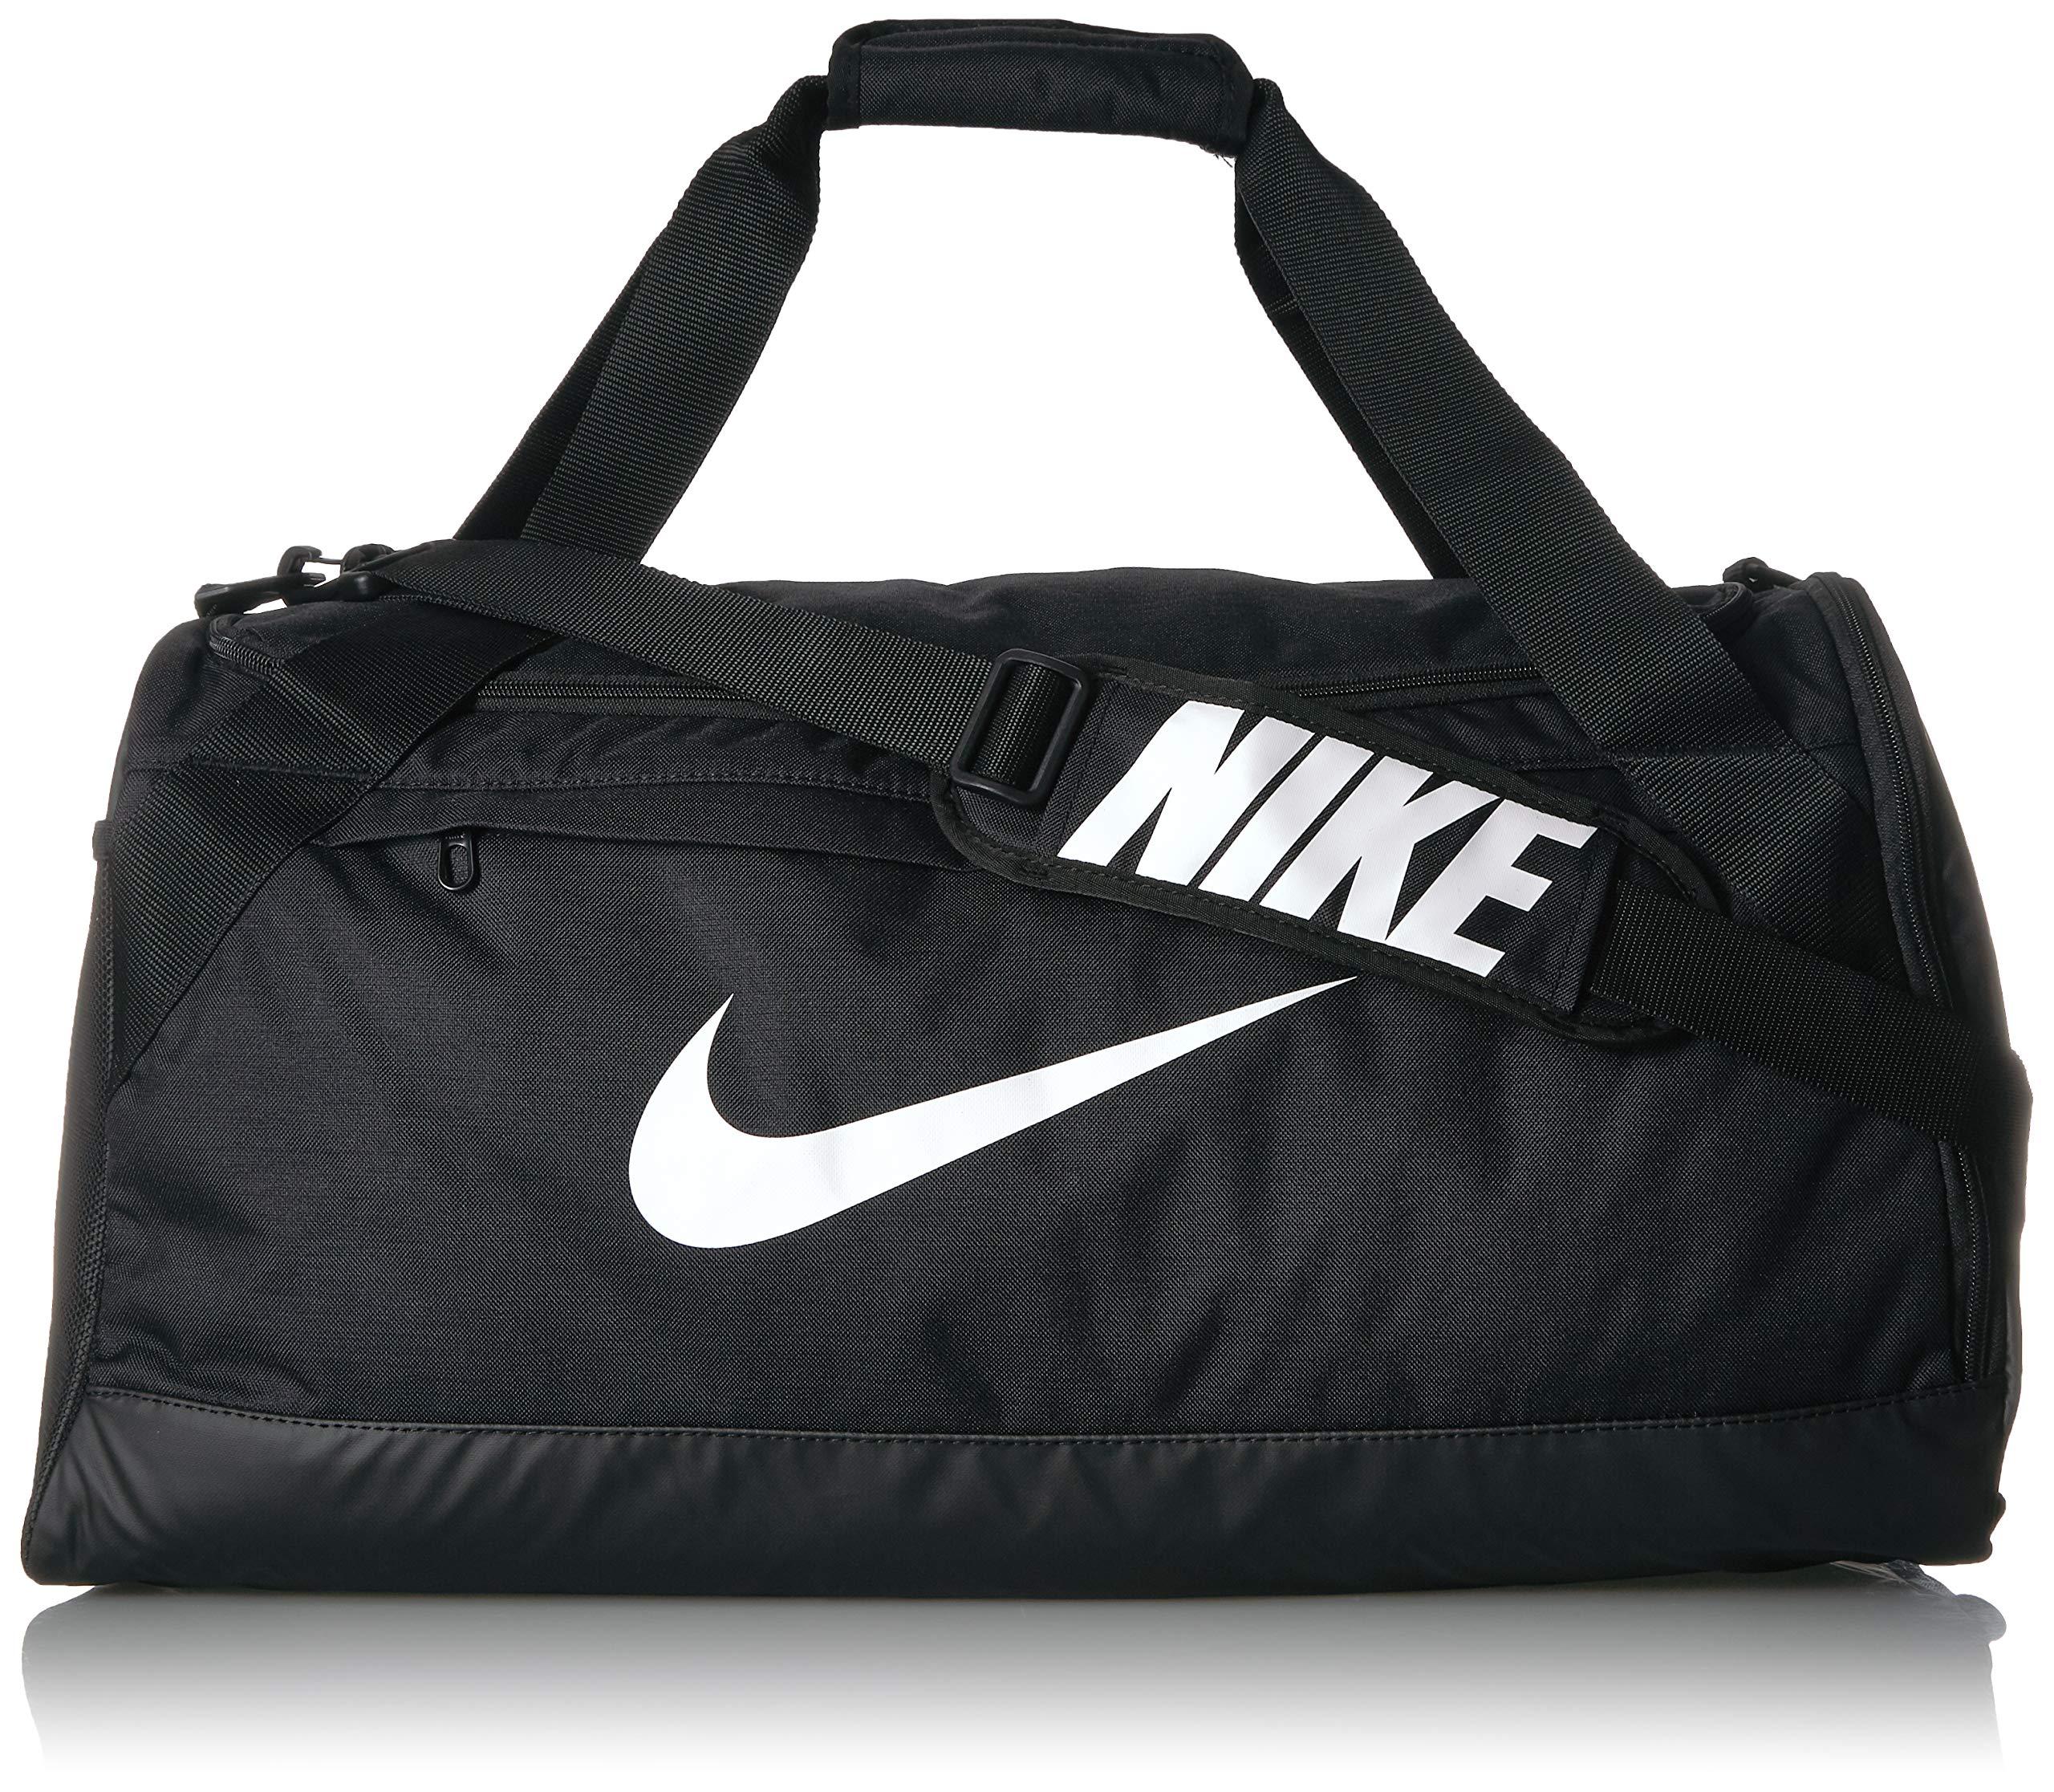 Nike Brasilia Training Duffel Bag, Versatile Bag with Padded Strap and Mesh Exterior Pocket, Medium, Black/Black/White